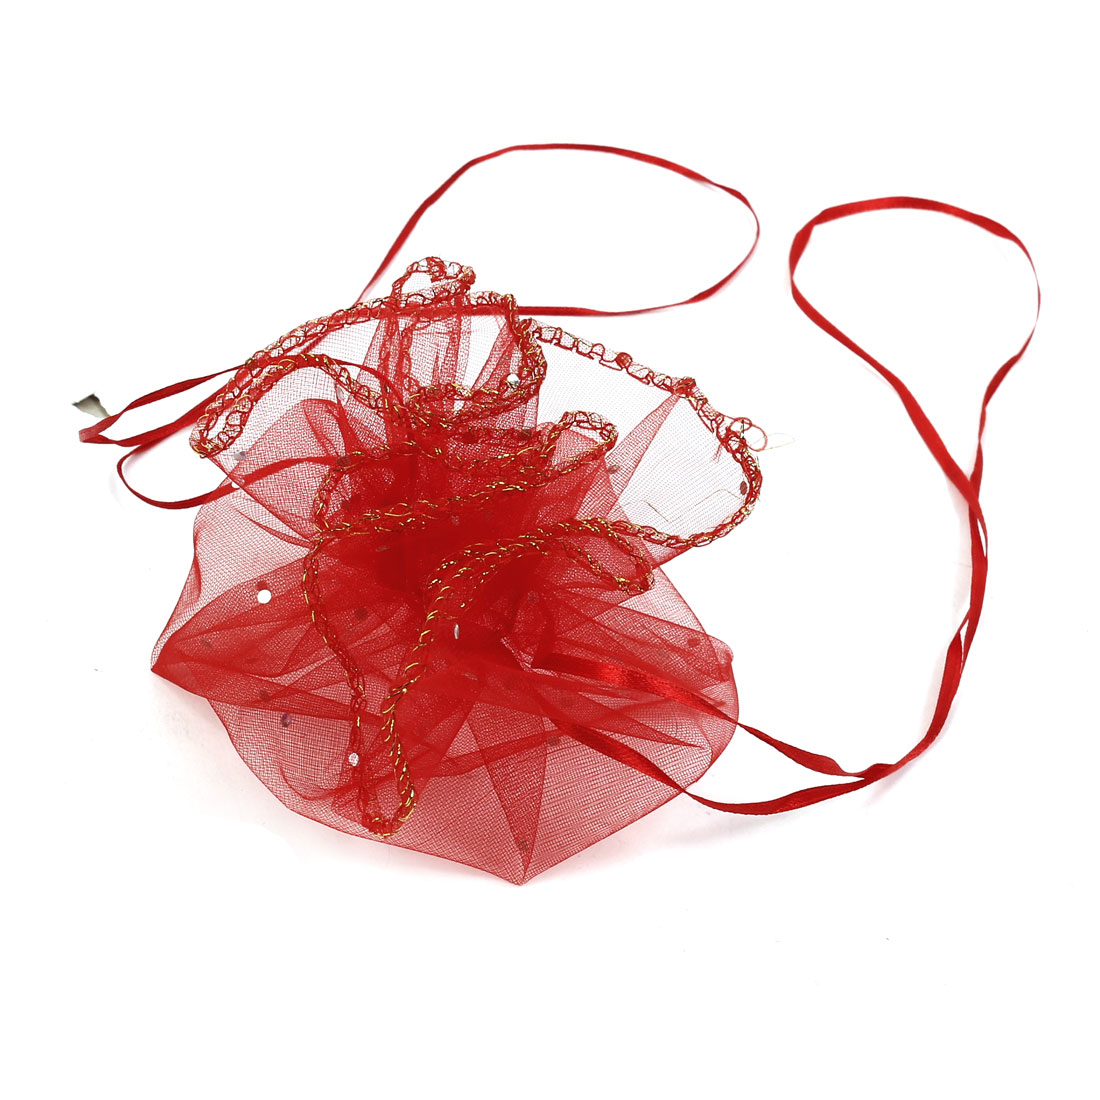 10 Pcs Silver Tone Paillette Decor Red Organza Wedding Candy Bag